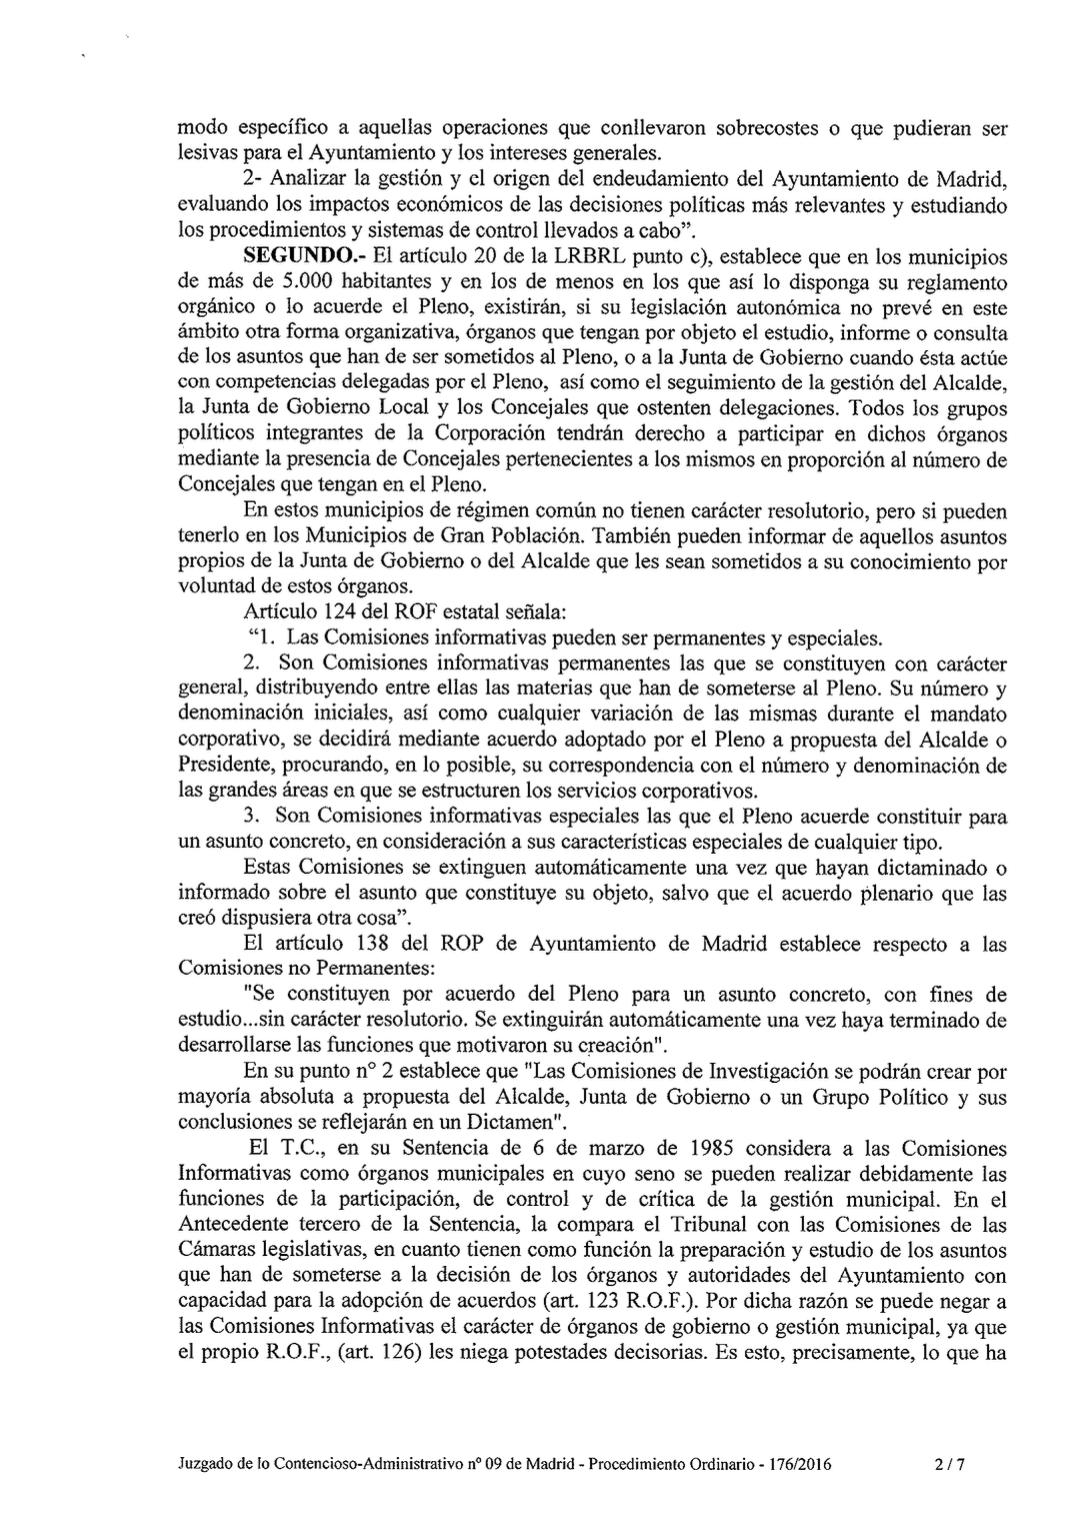 Comision-Anti-PP-Ilegal-Carmena-2.png